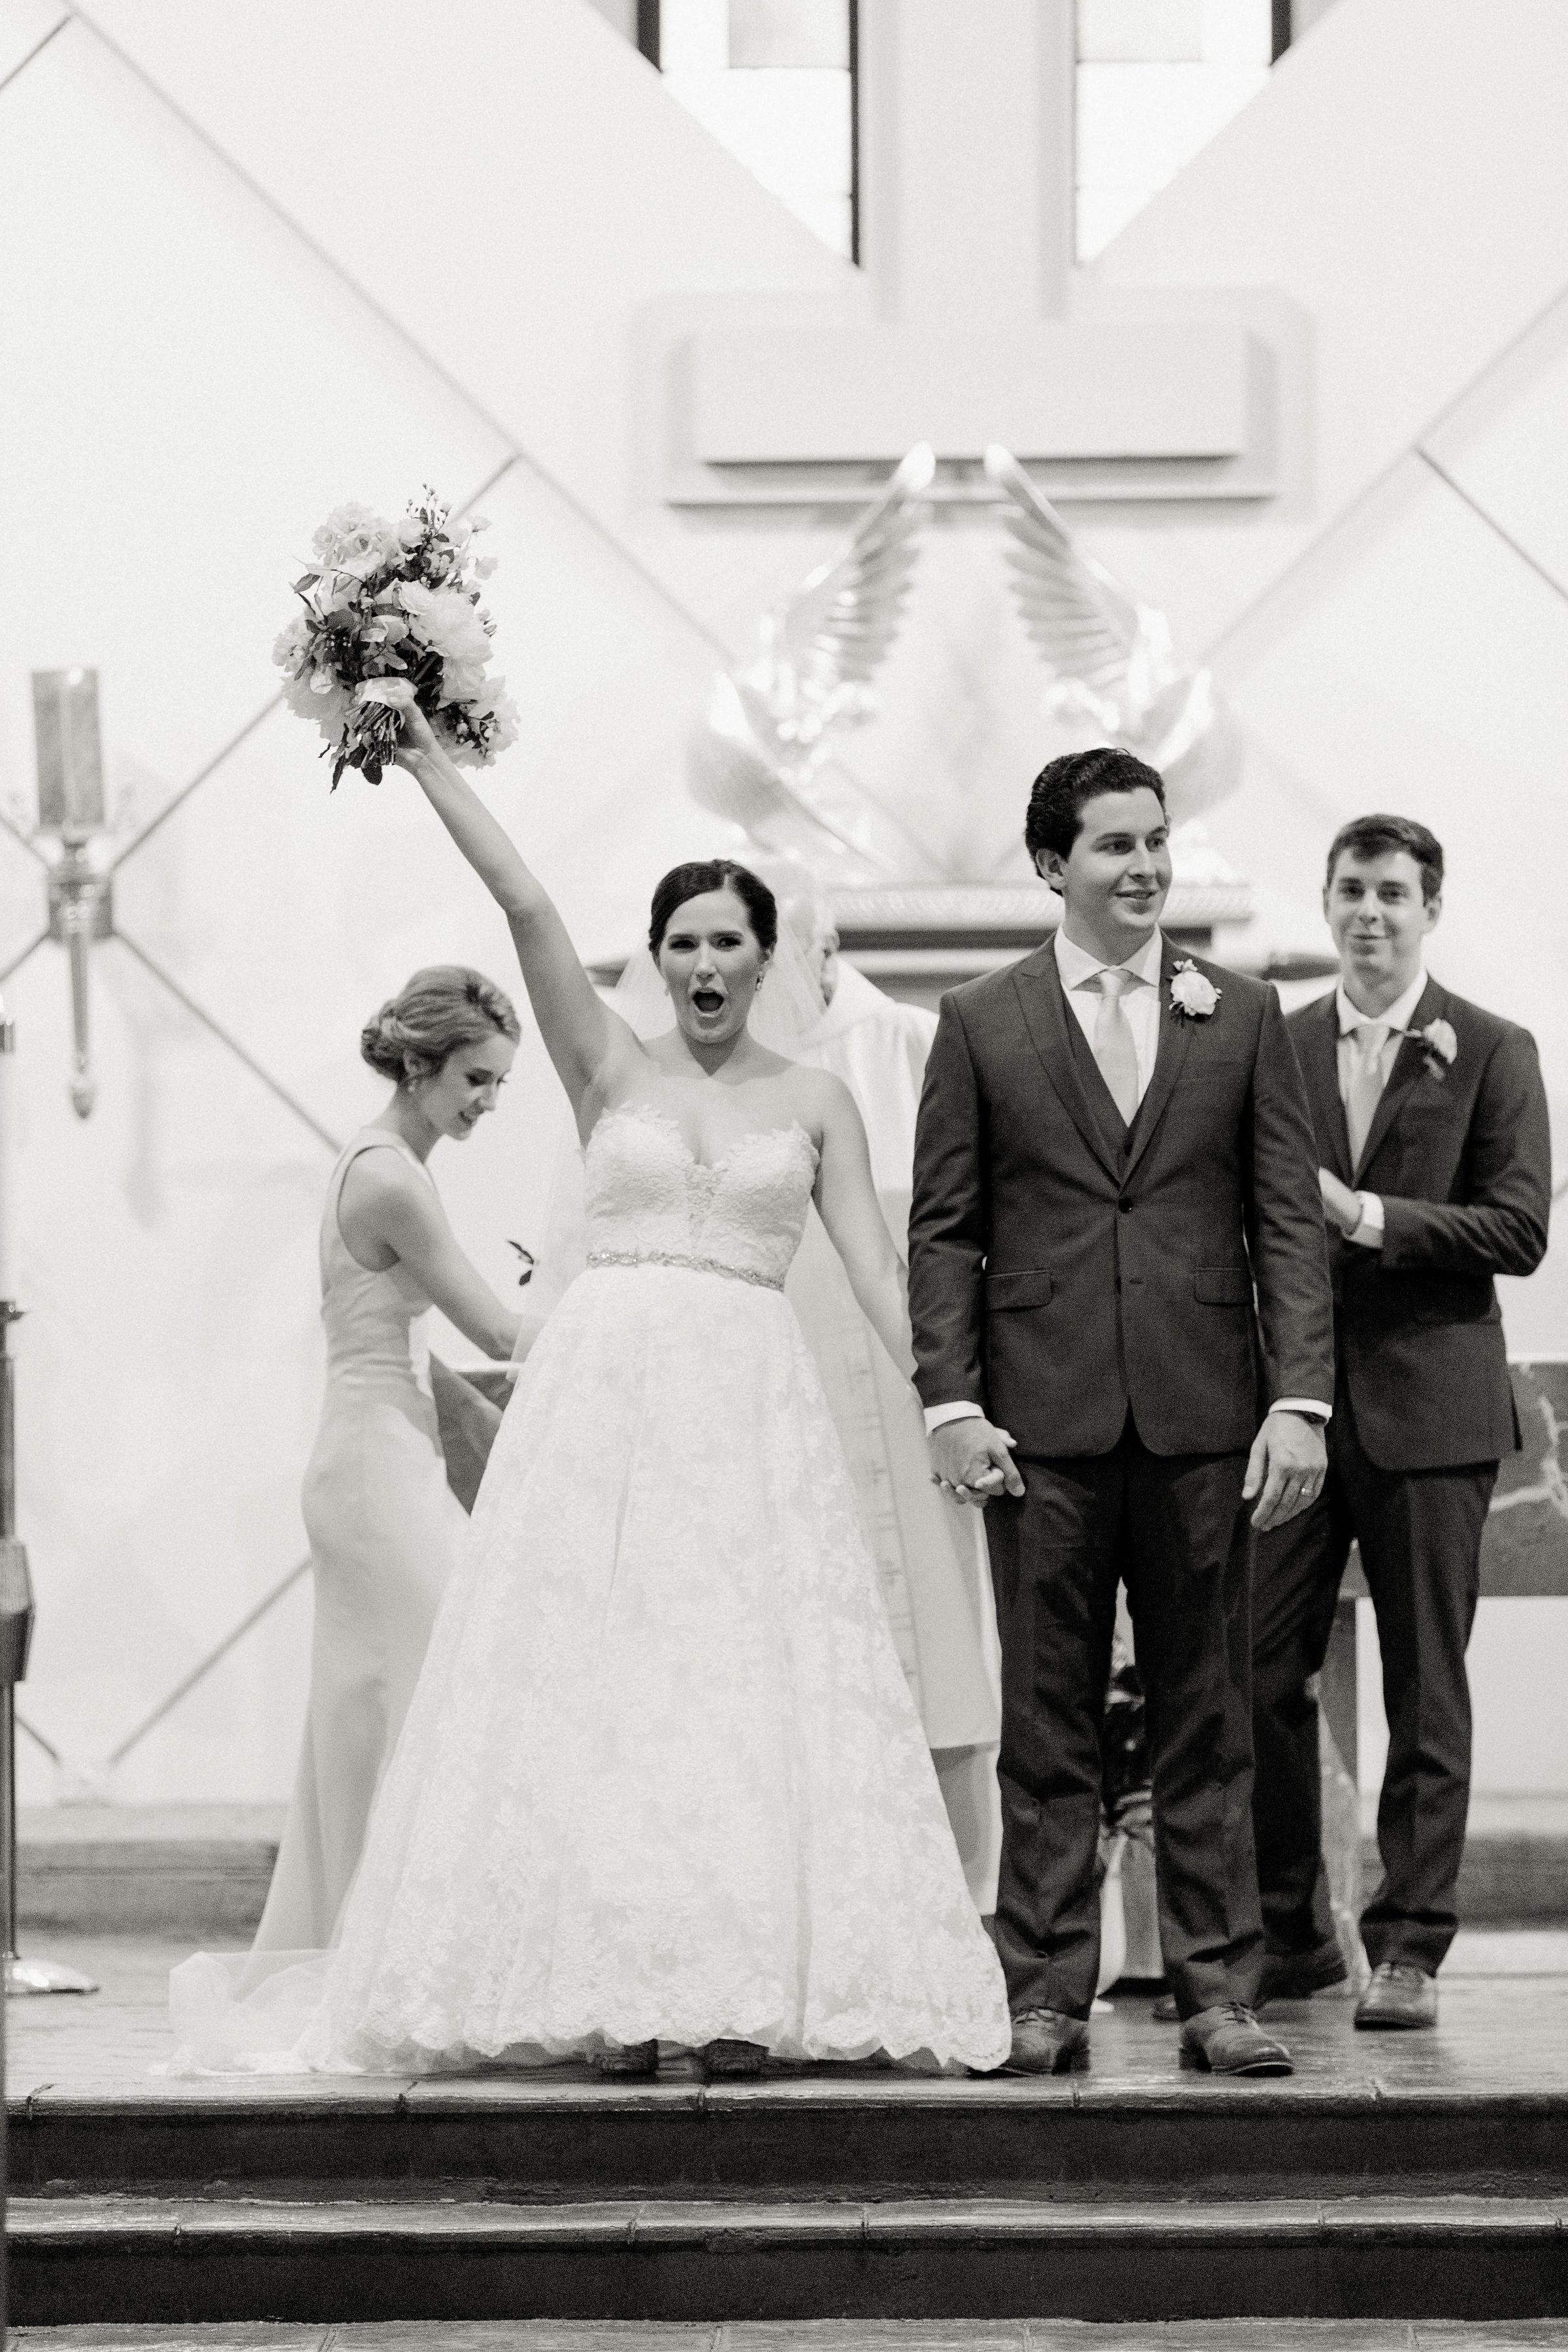 McElravey_Wedding_CarolineLimaPhotography_2018_134.jpg